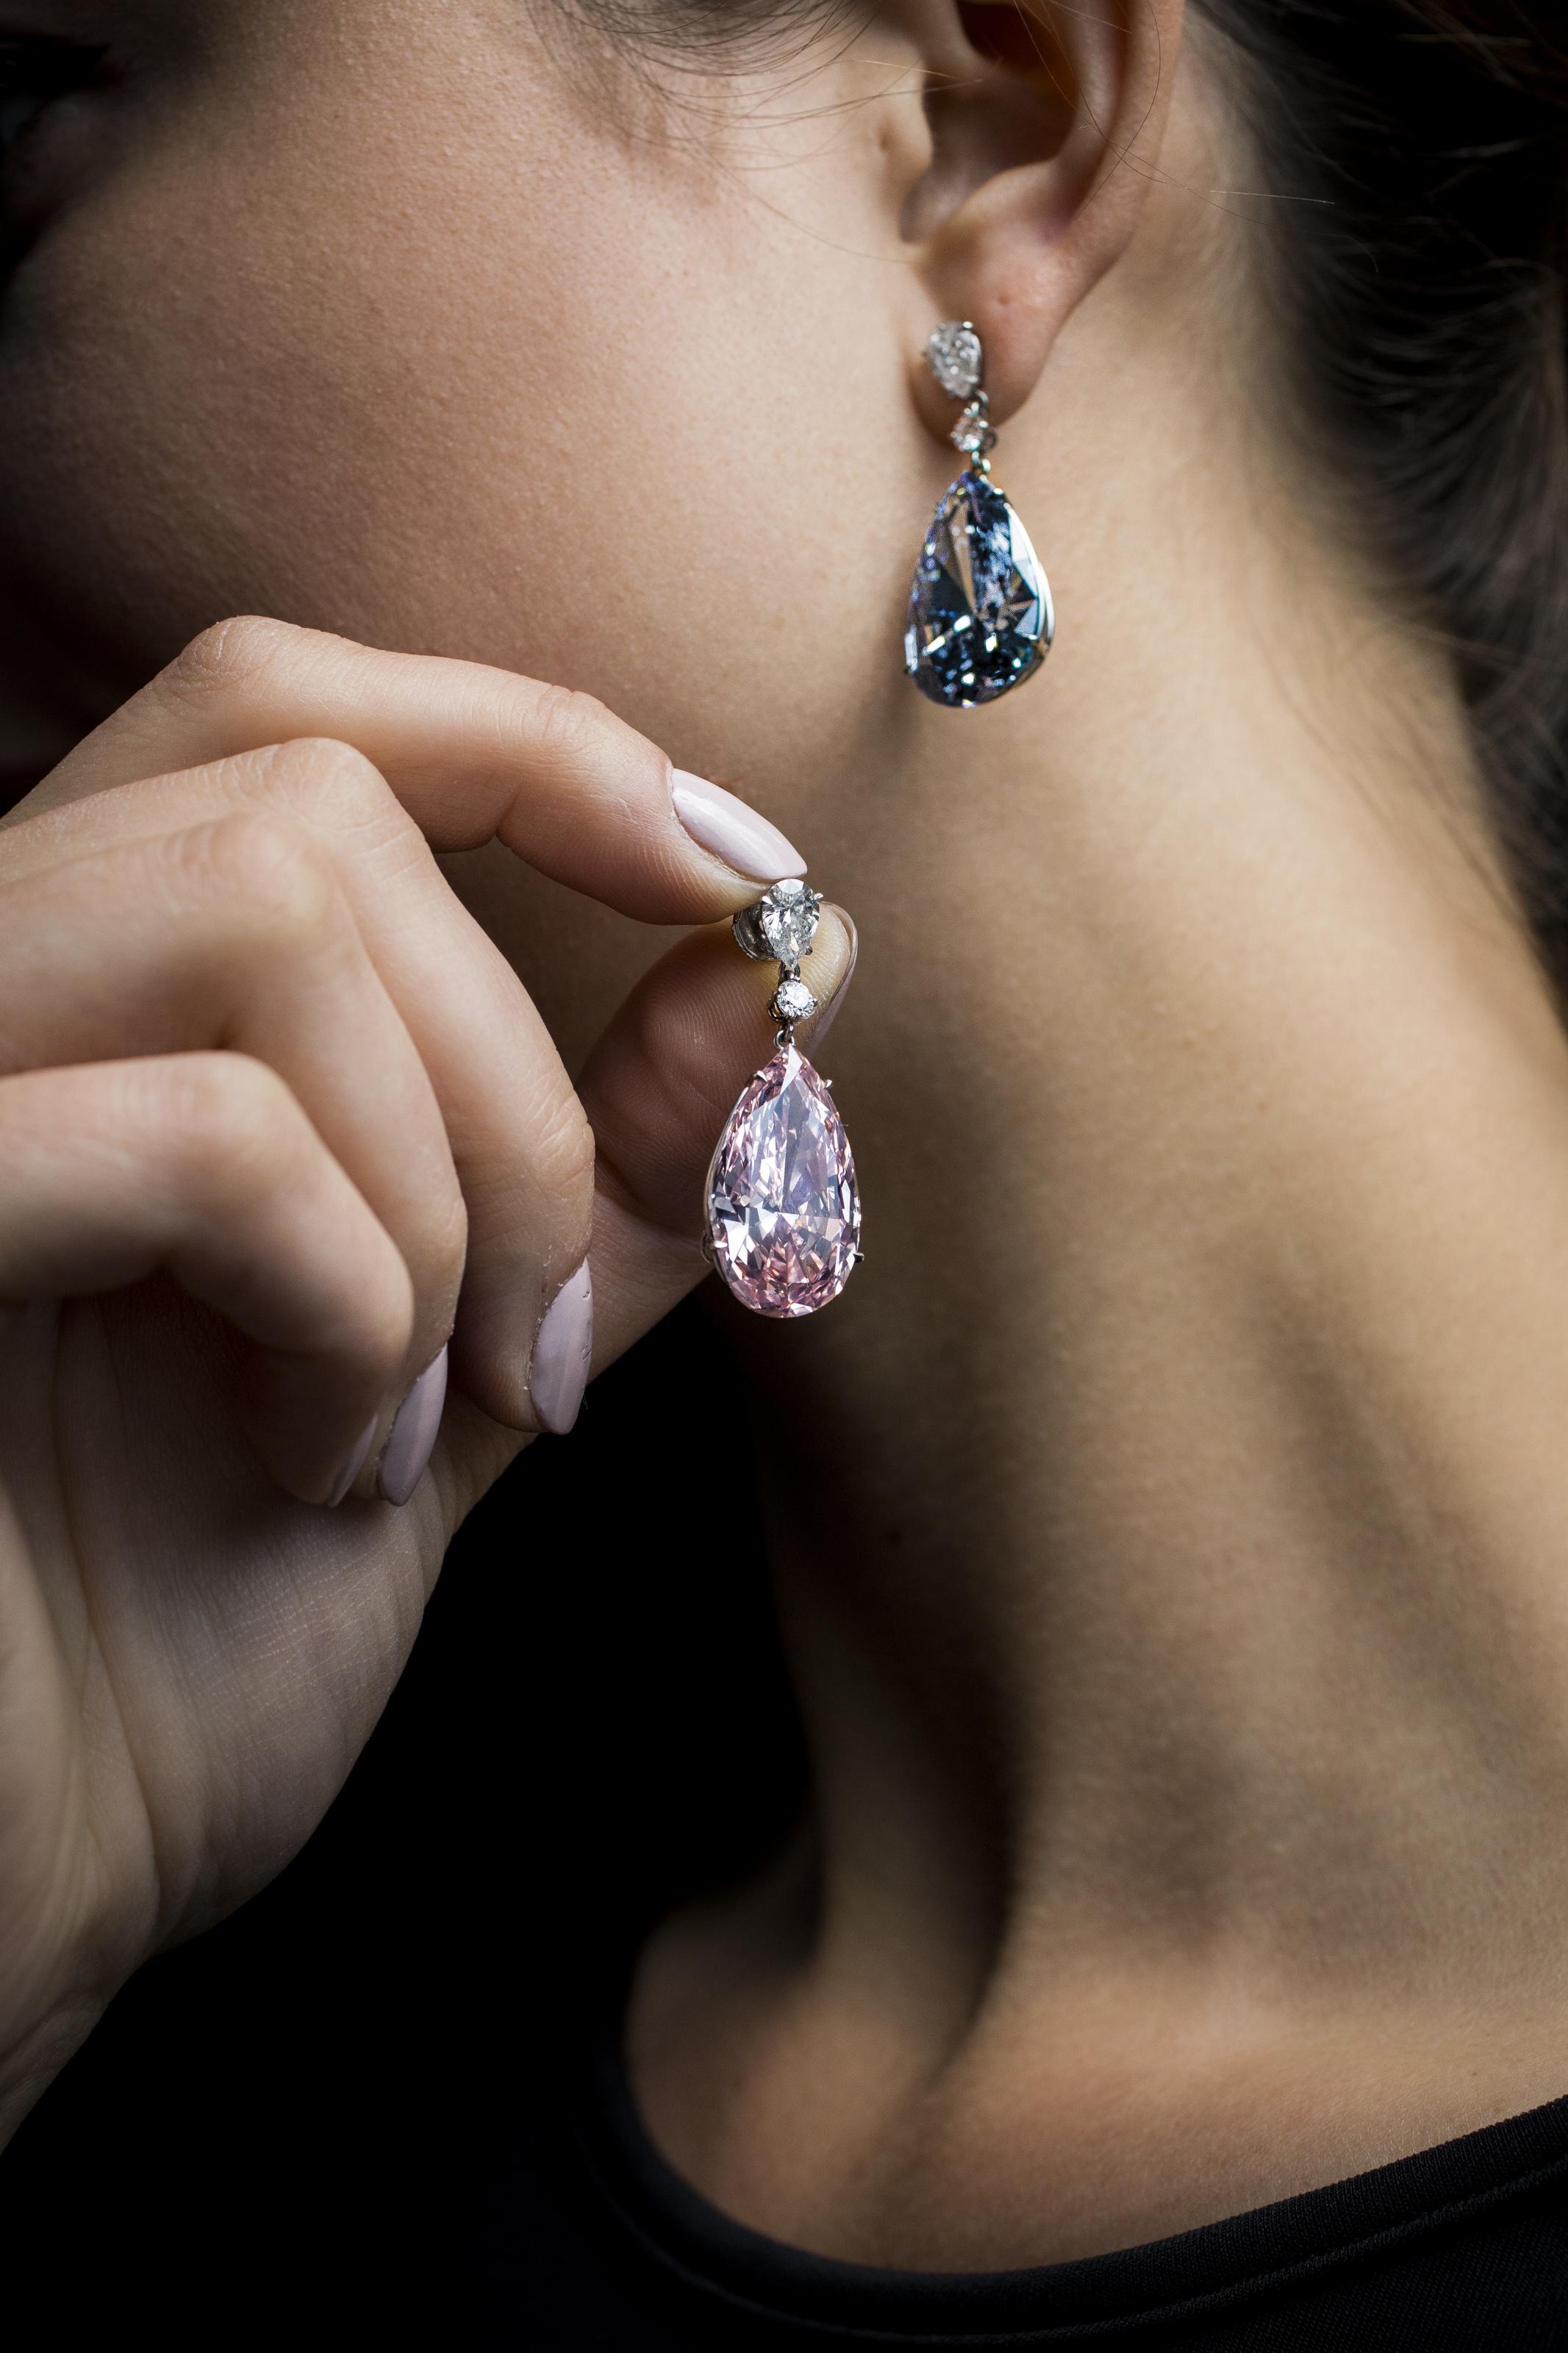 On the rocks apollo and artemis diamonds